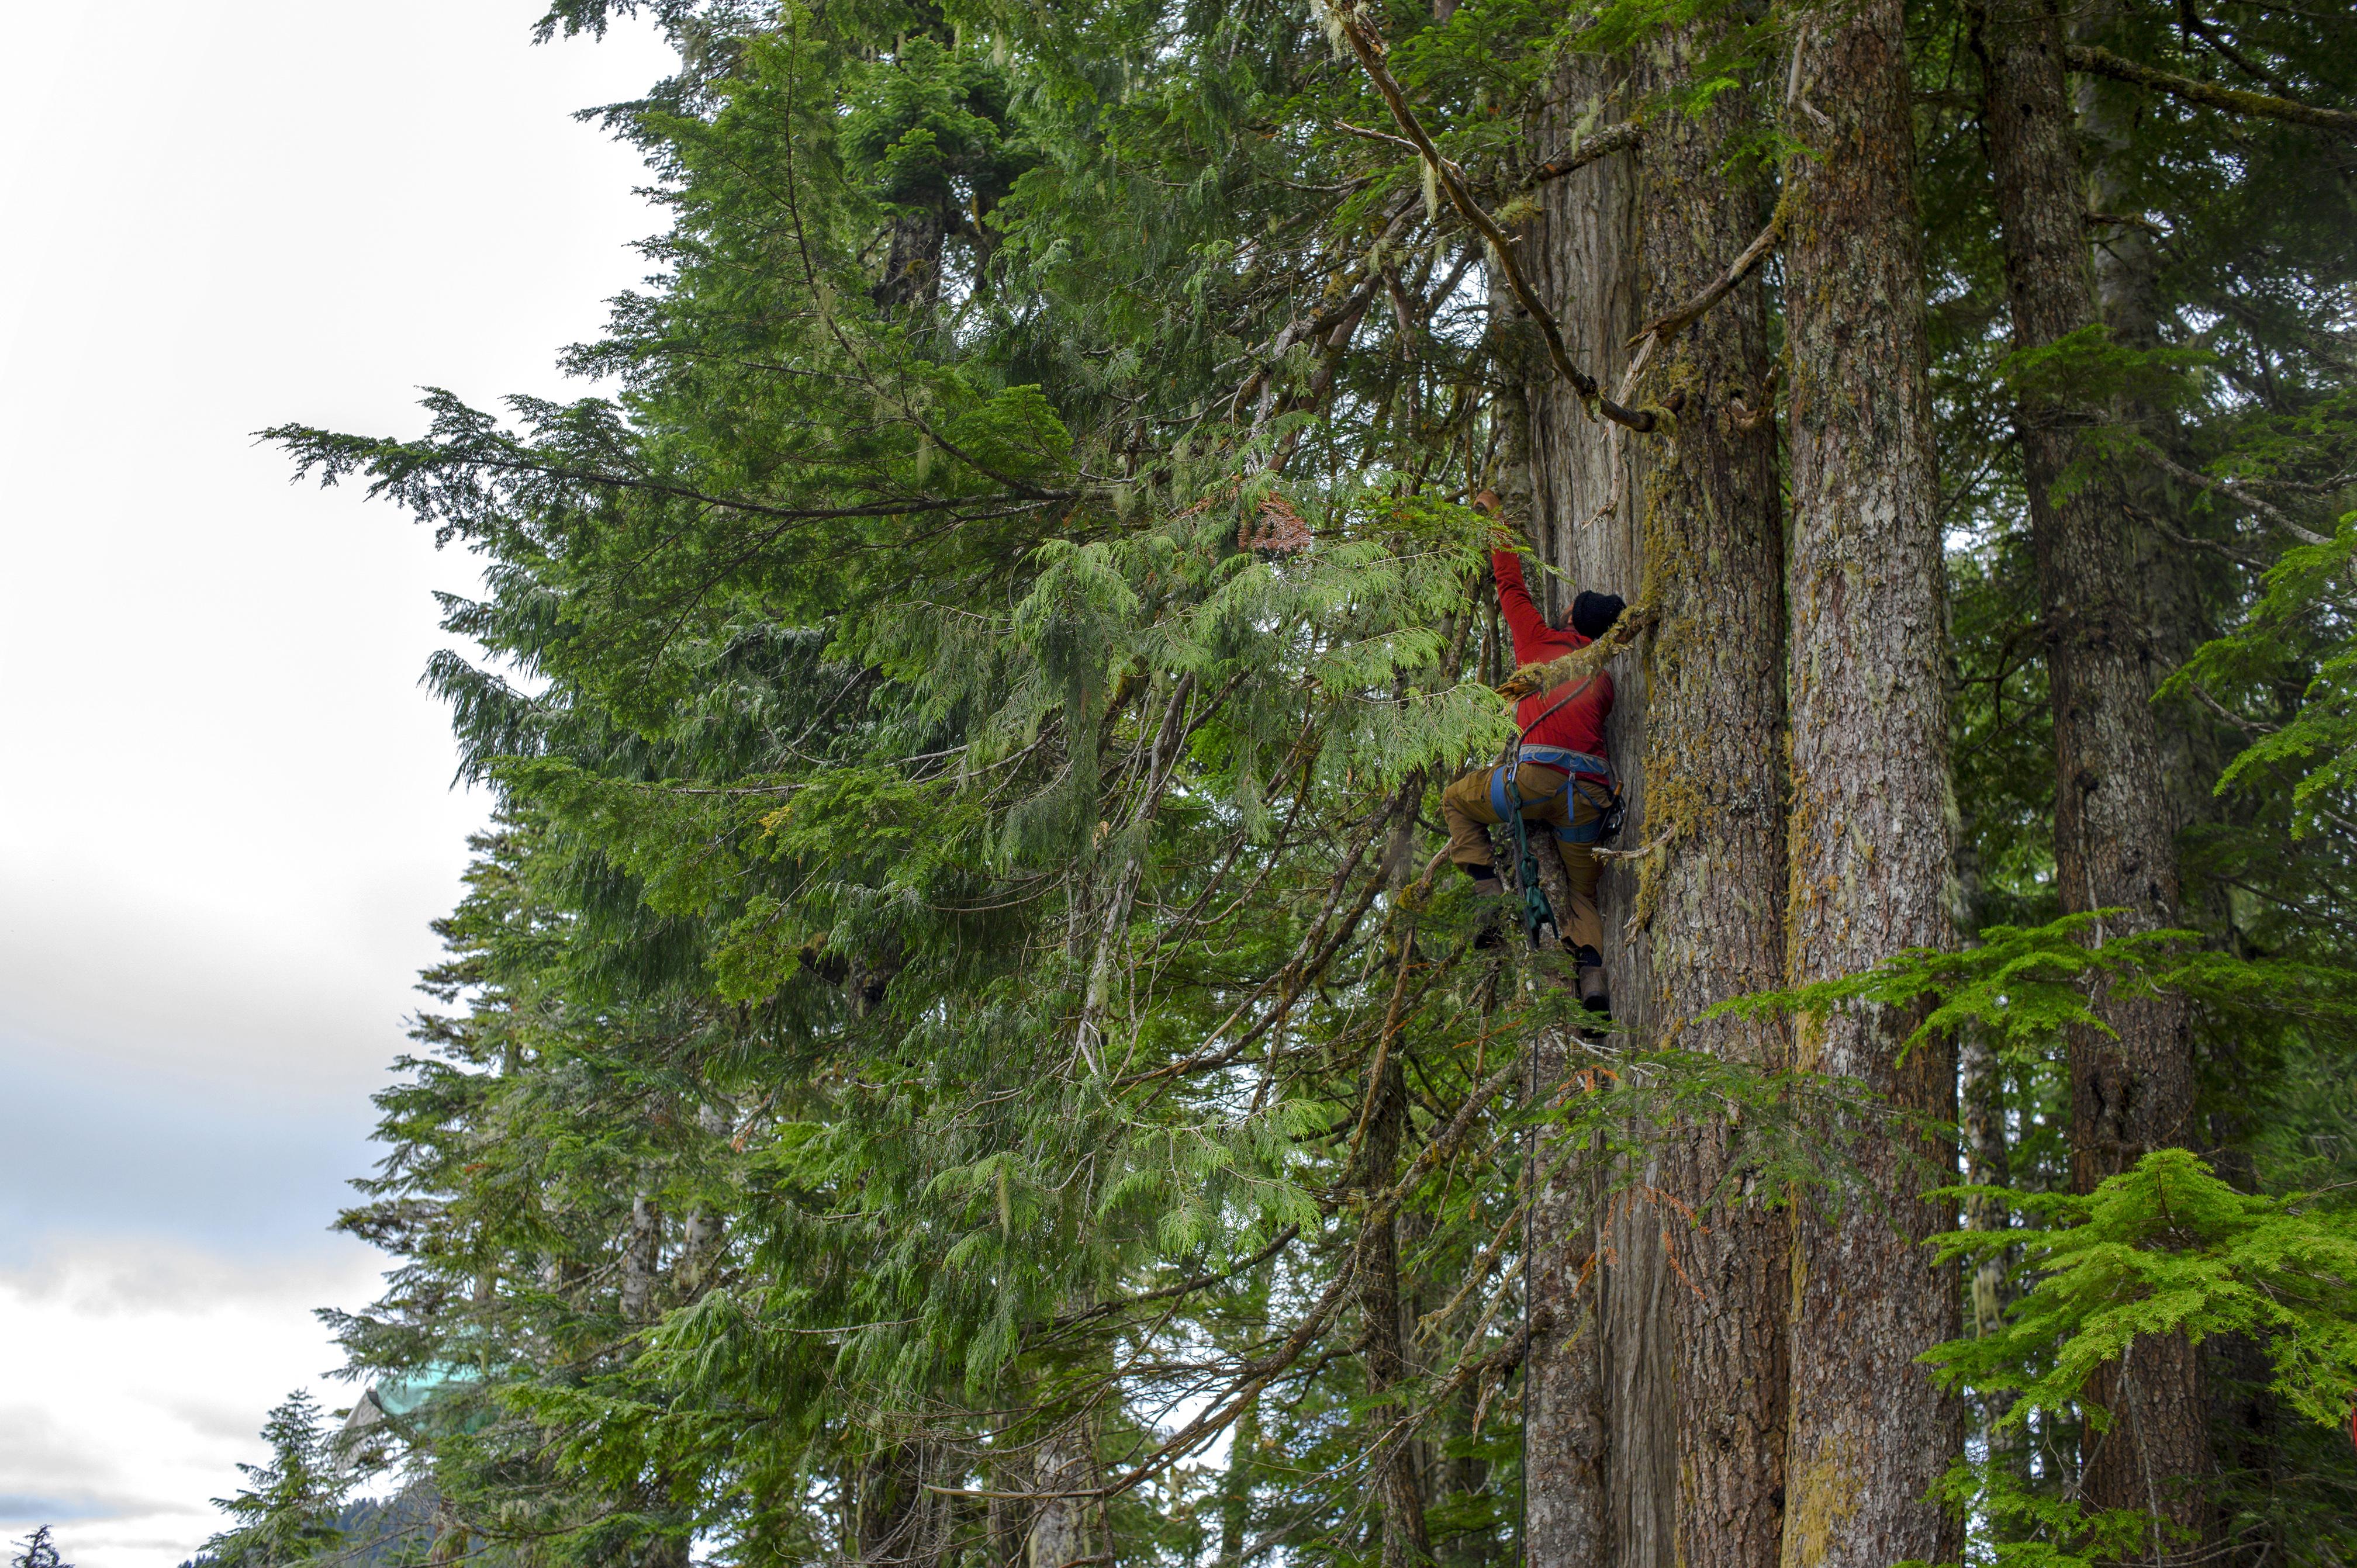 Savard climbs a tree to secure a tree-sit. (Kieran Oudshoorn/CBC)